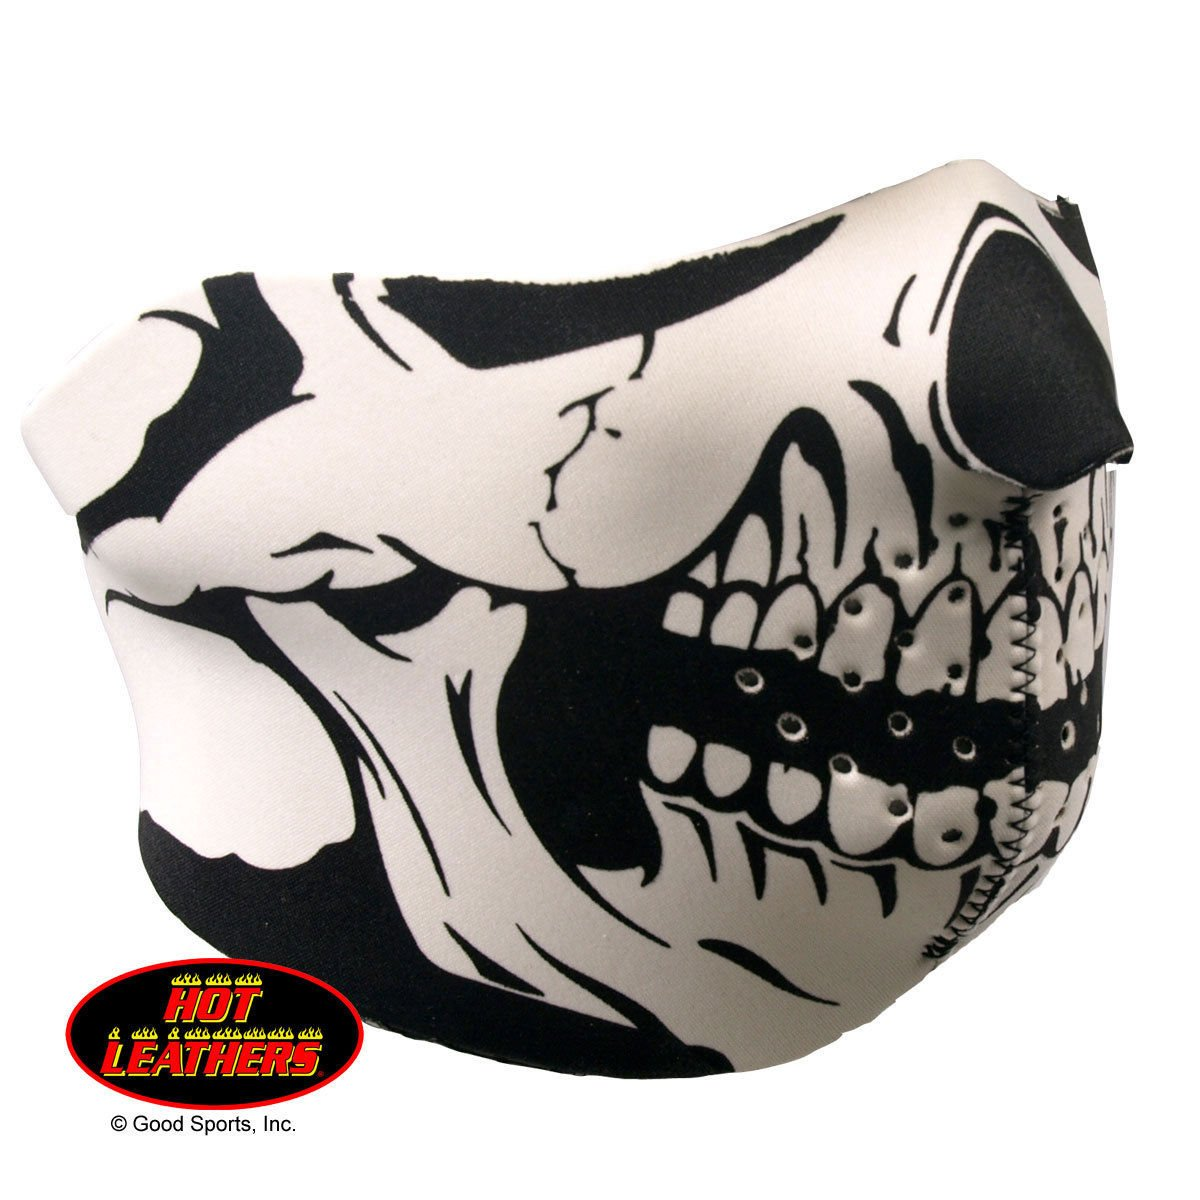 Hot Leathers Half Neoprene Face Mask Reversible to Solid Black Classic Black White Skull